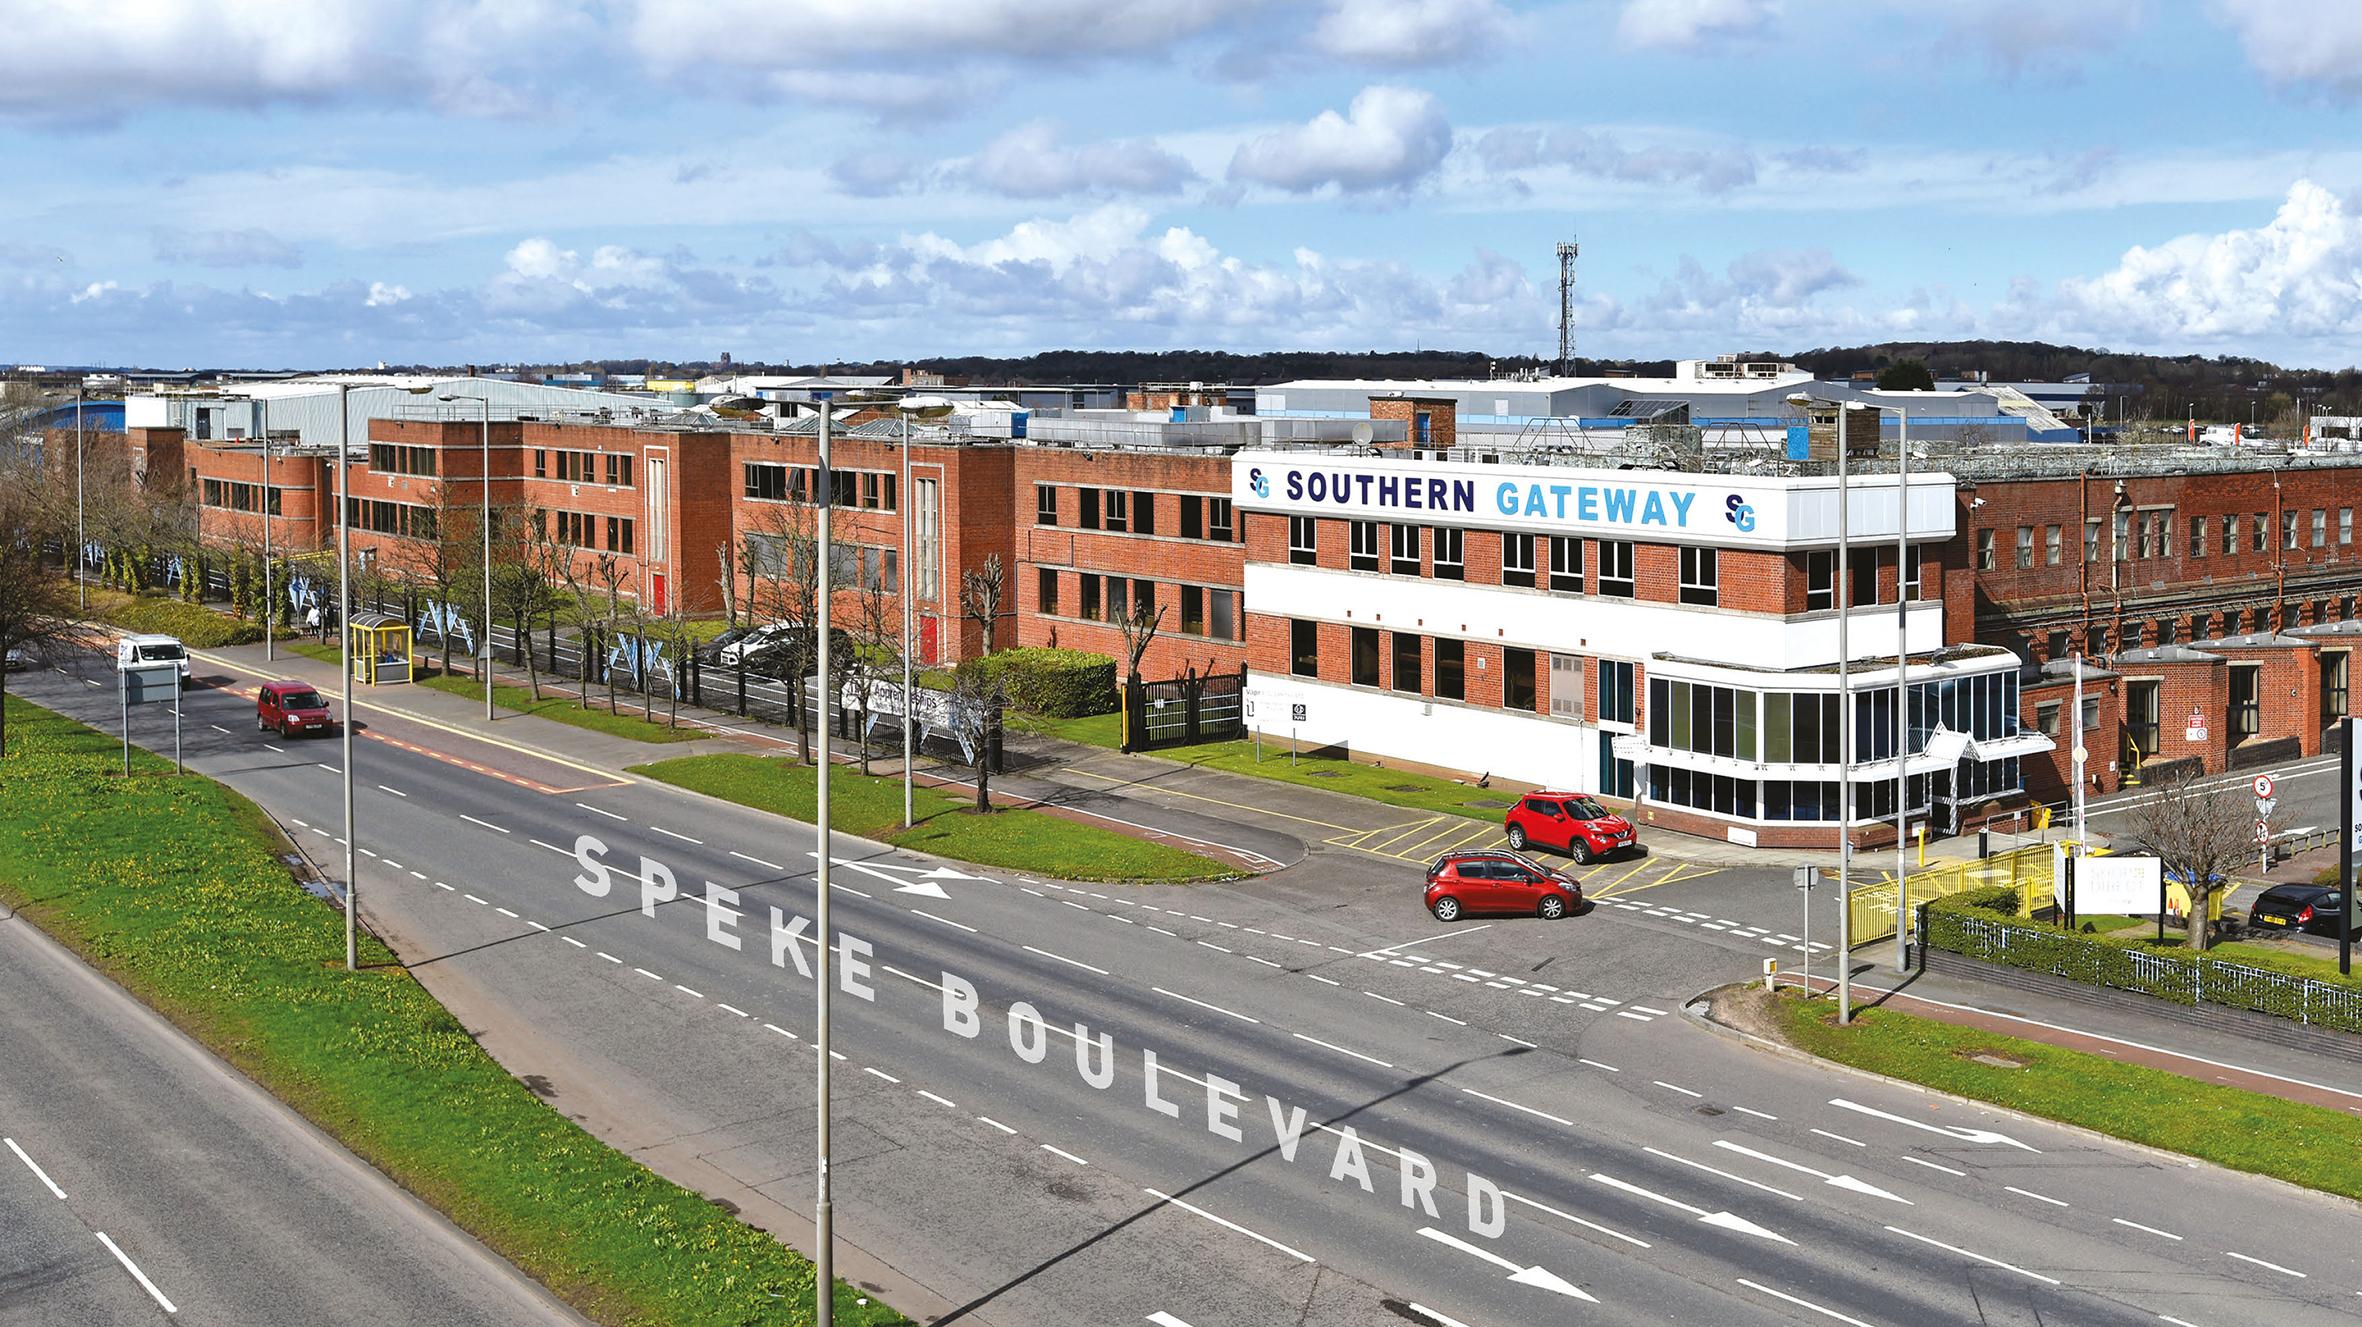 Industrial Liverpool, L24 9HZ - Units G9, G10 & G11, Southern Gateway